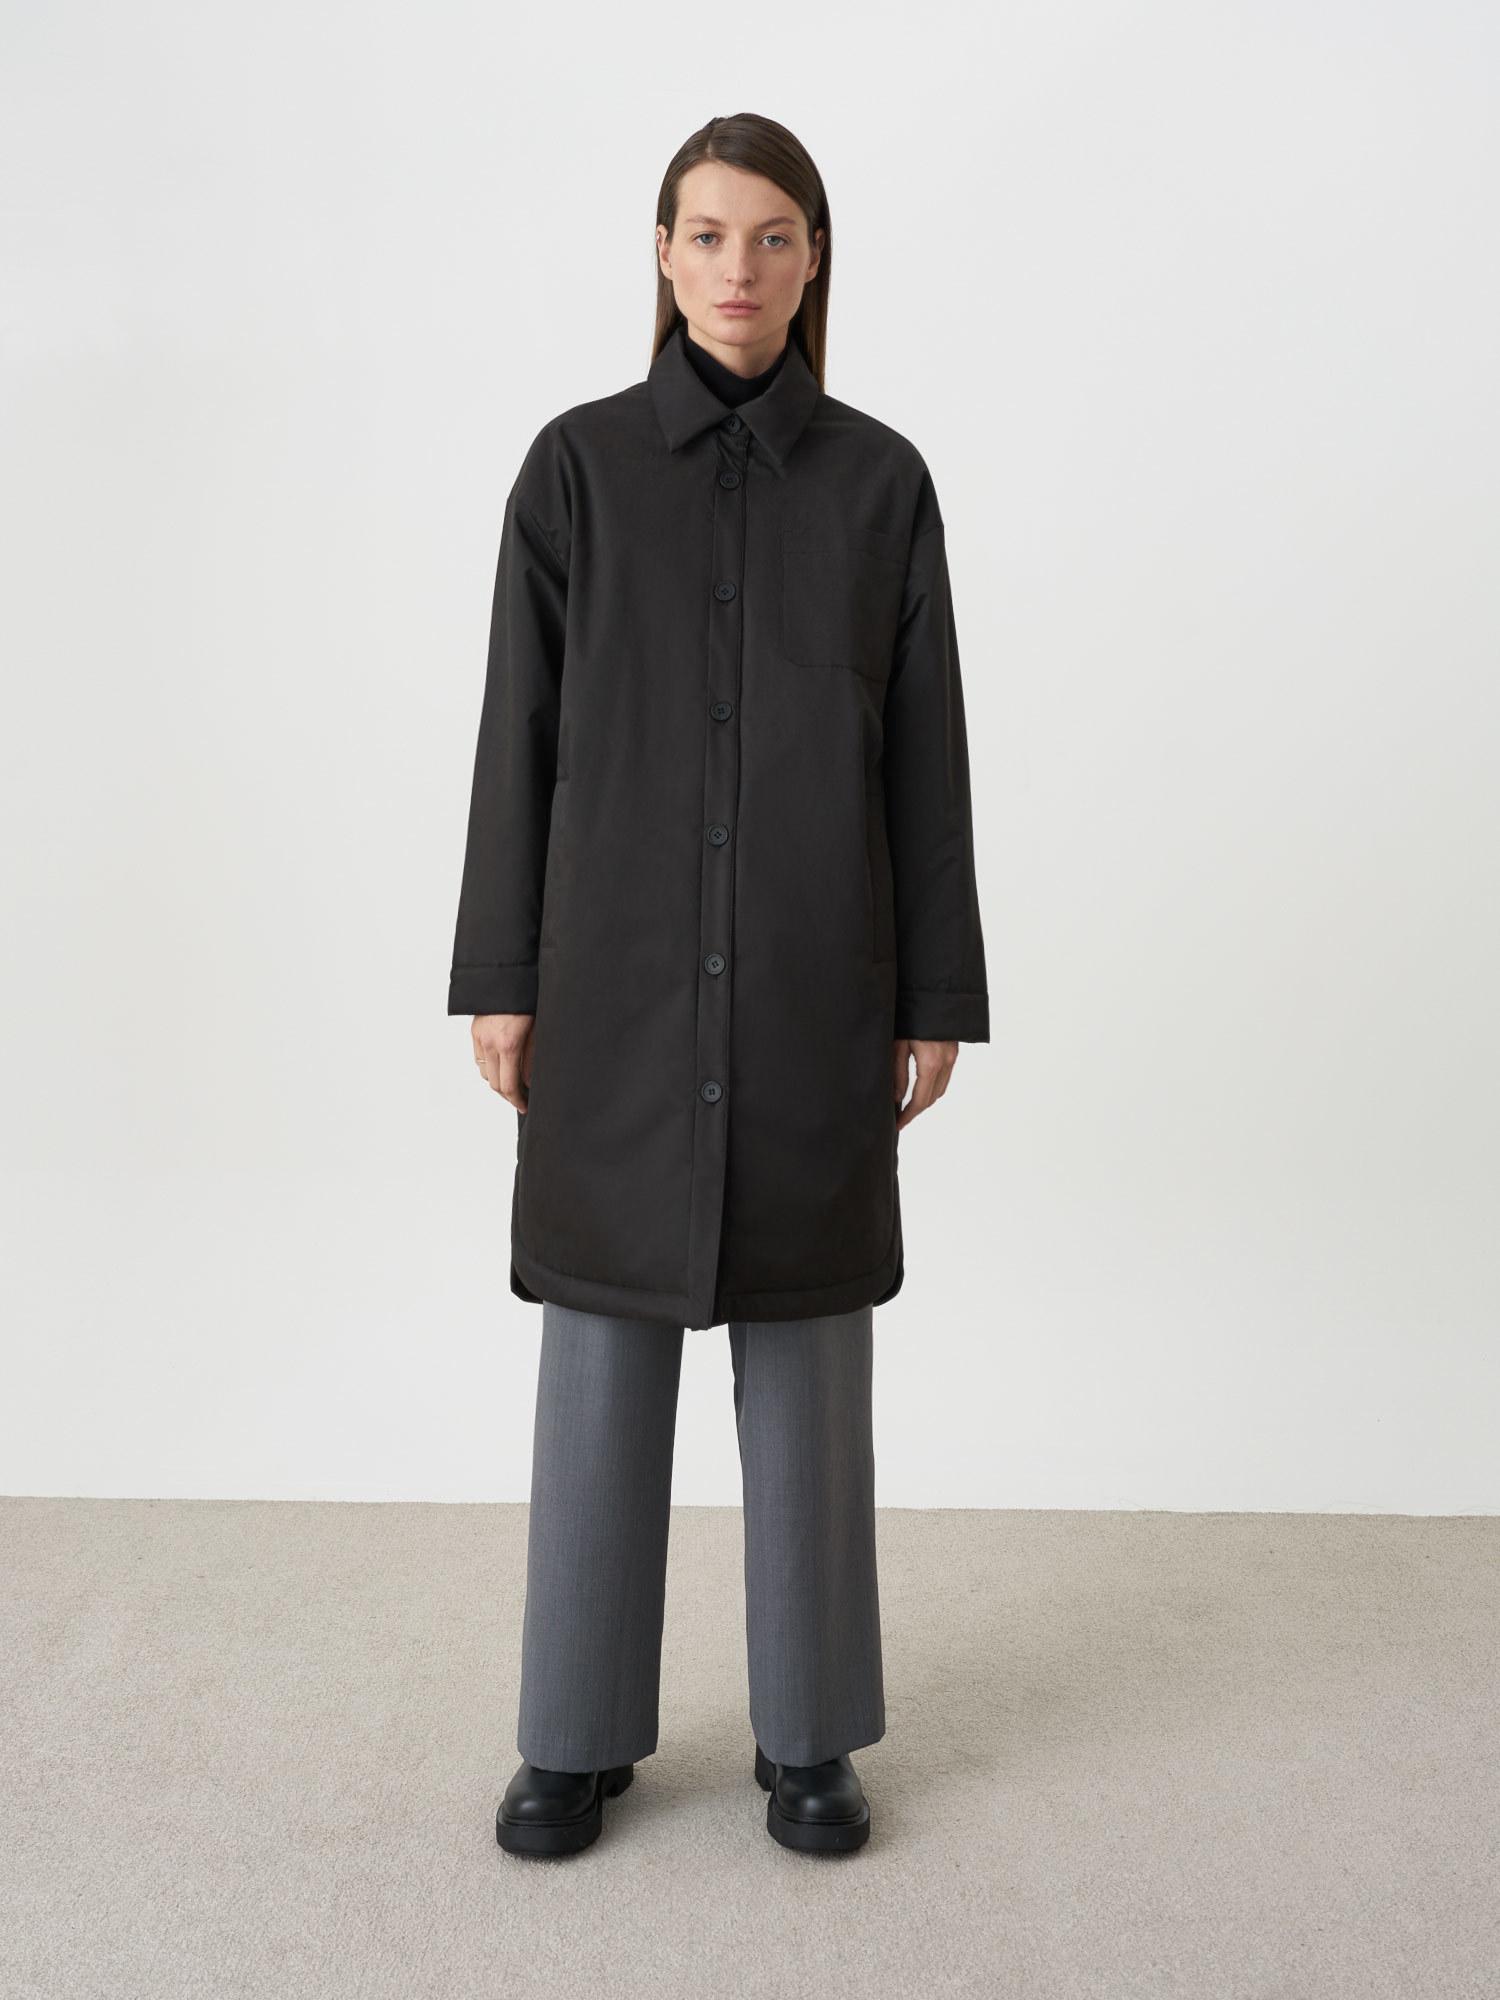 Куртка-рубашка Краснодар удлиненная